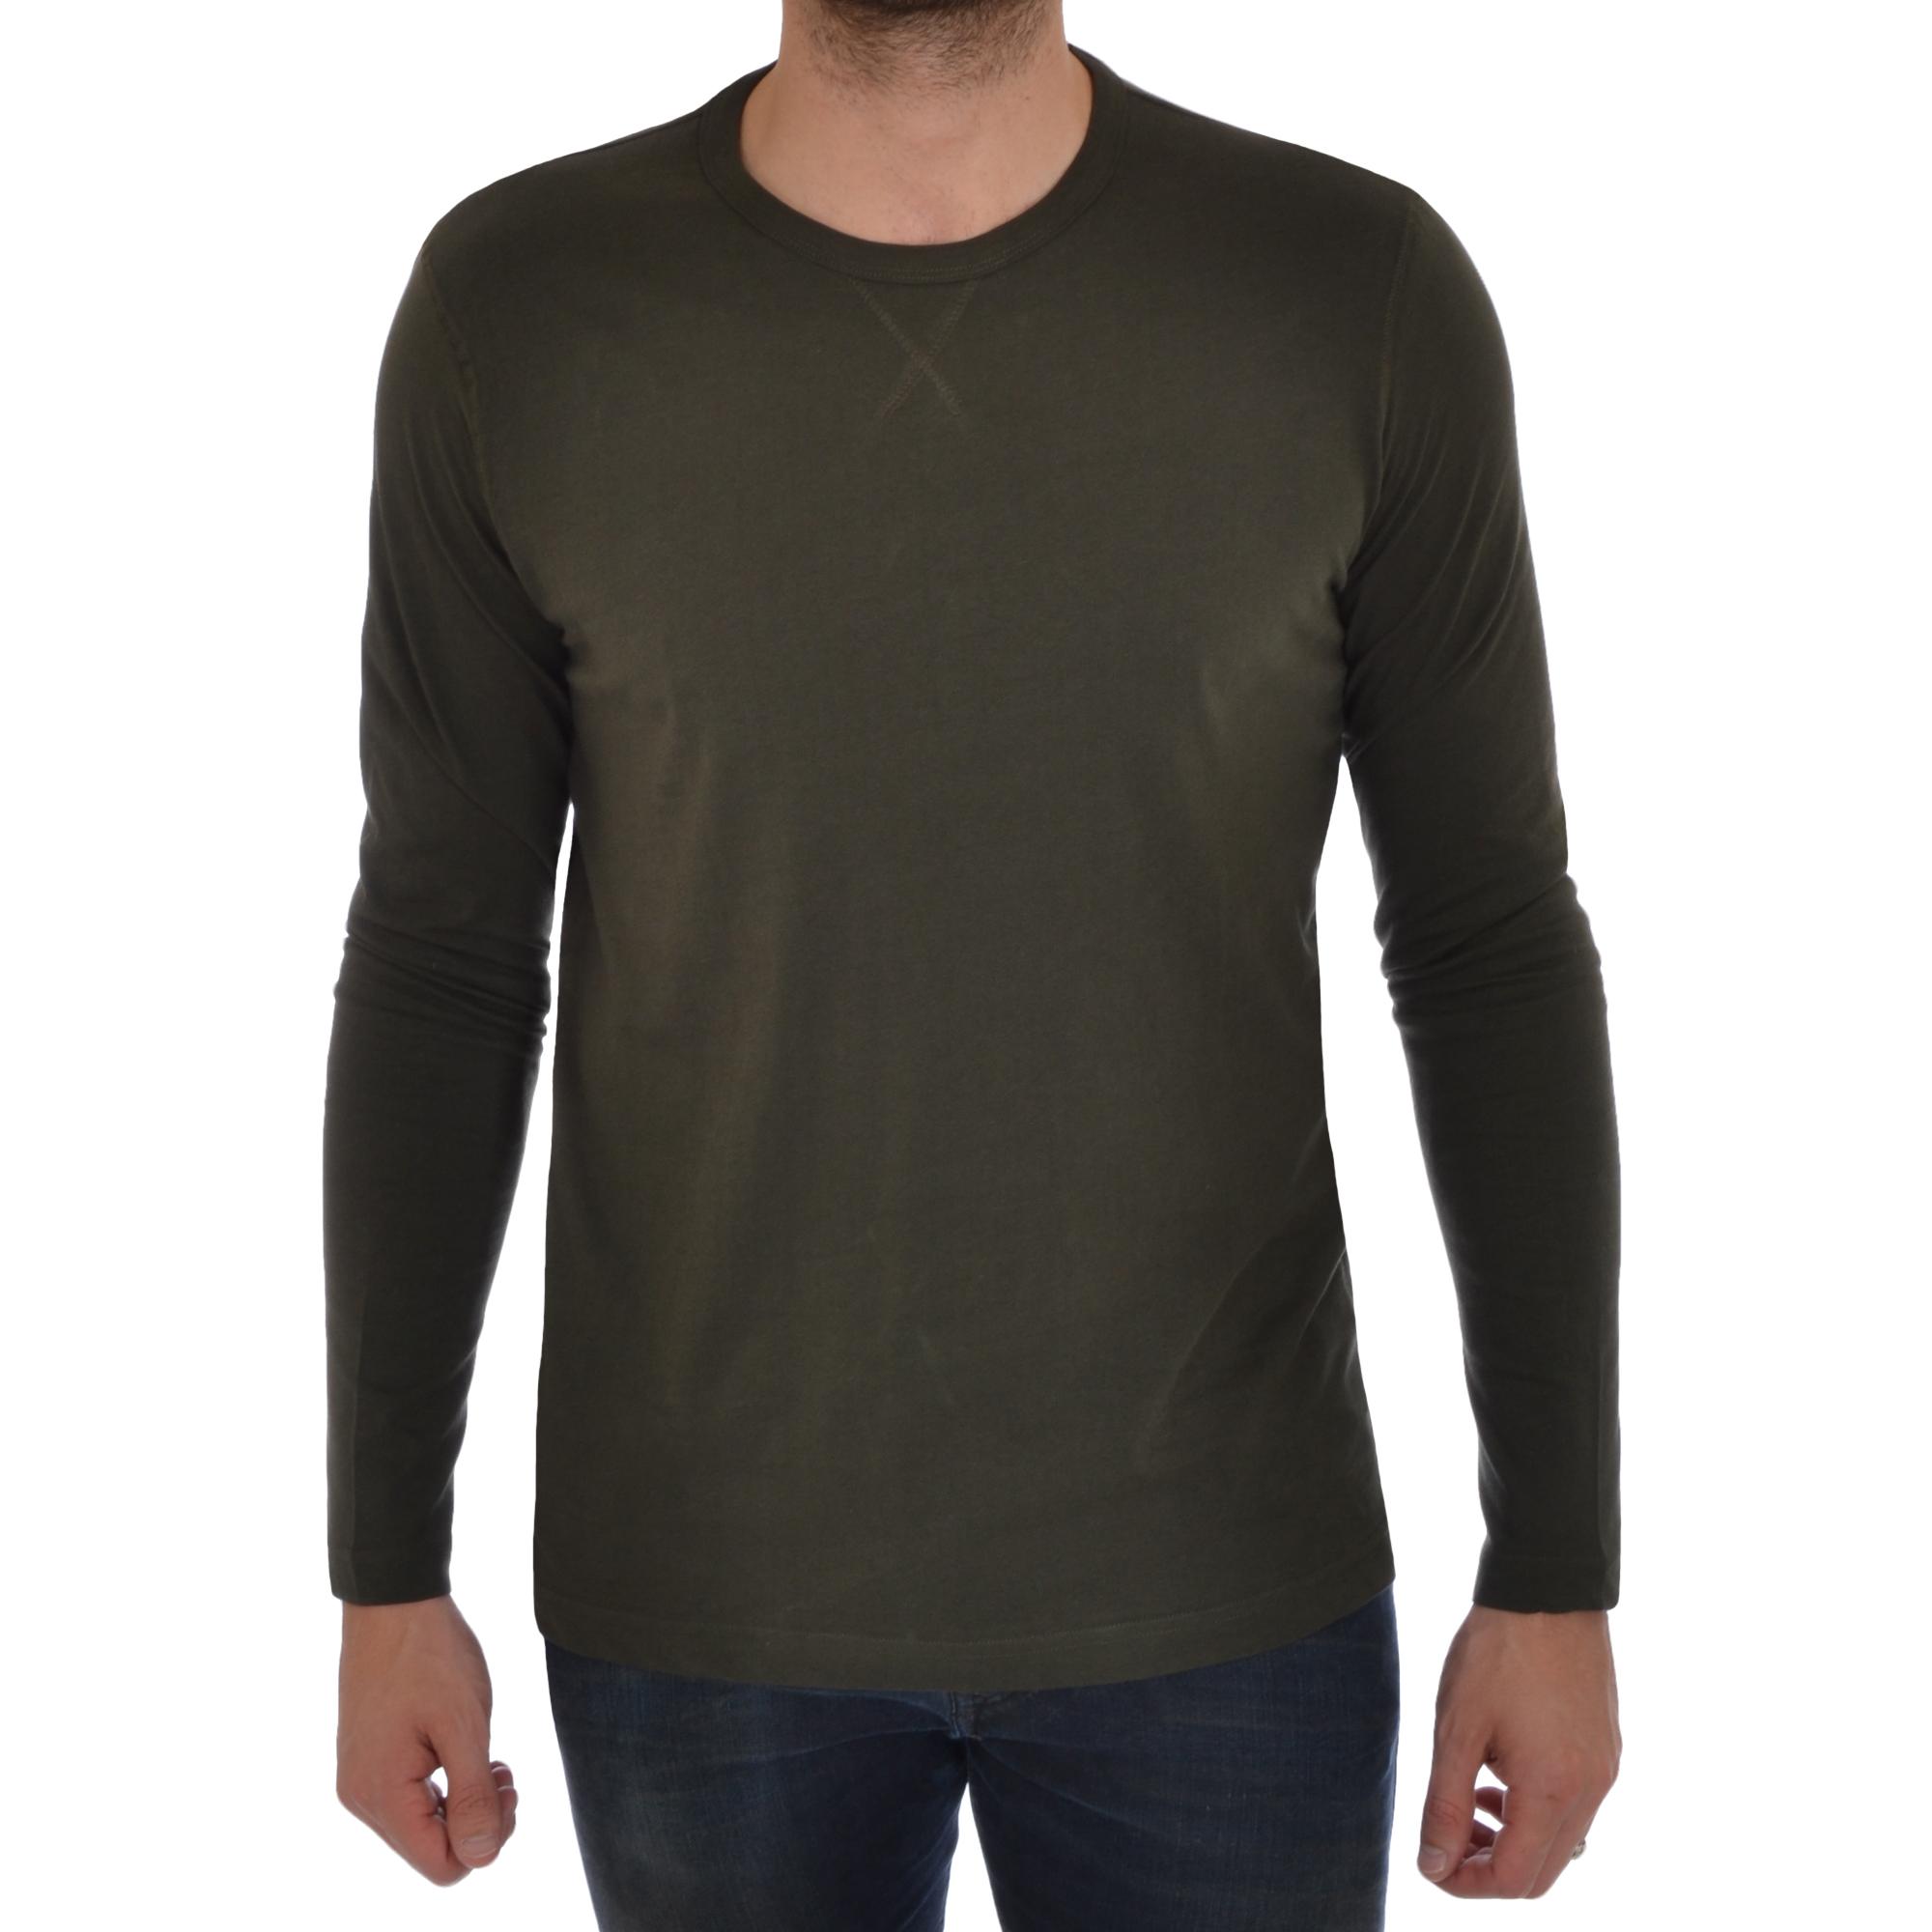 Brave Soul Mens Long Sleeve T-Shirt Plain Crew Neck Casual Top | eBay